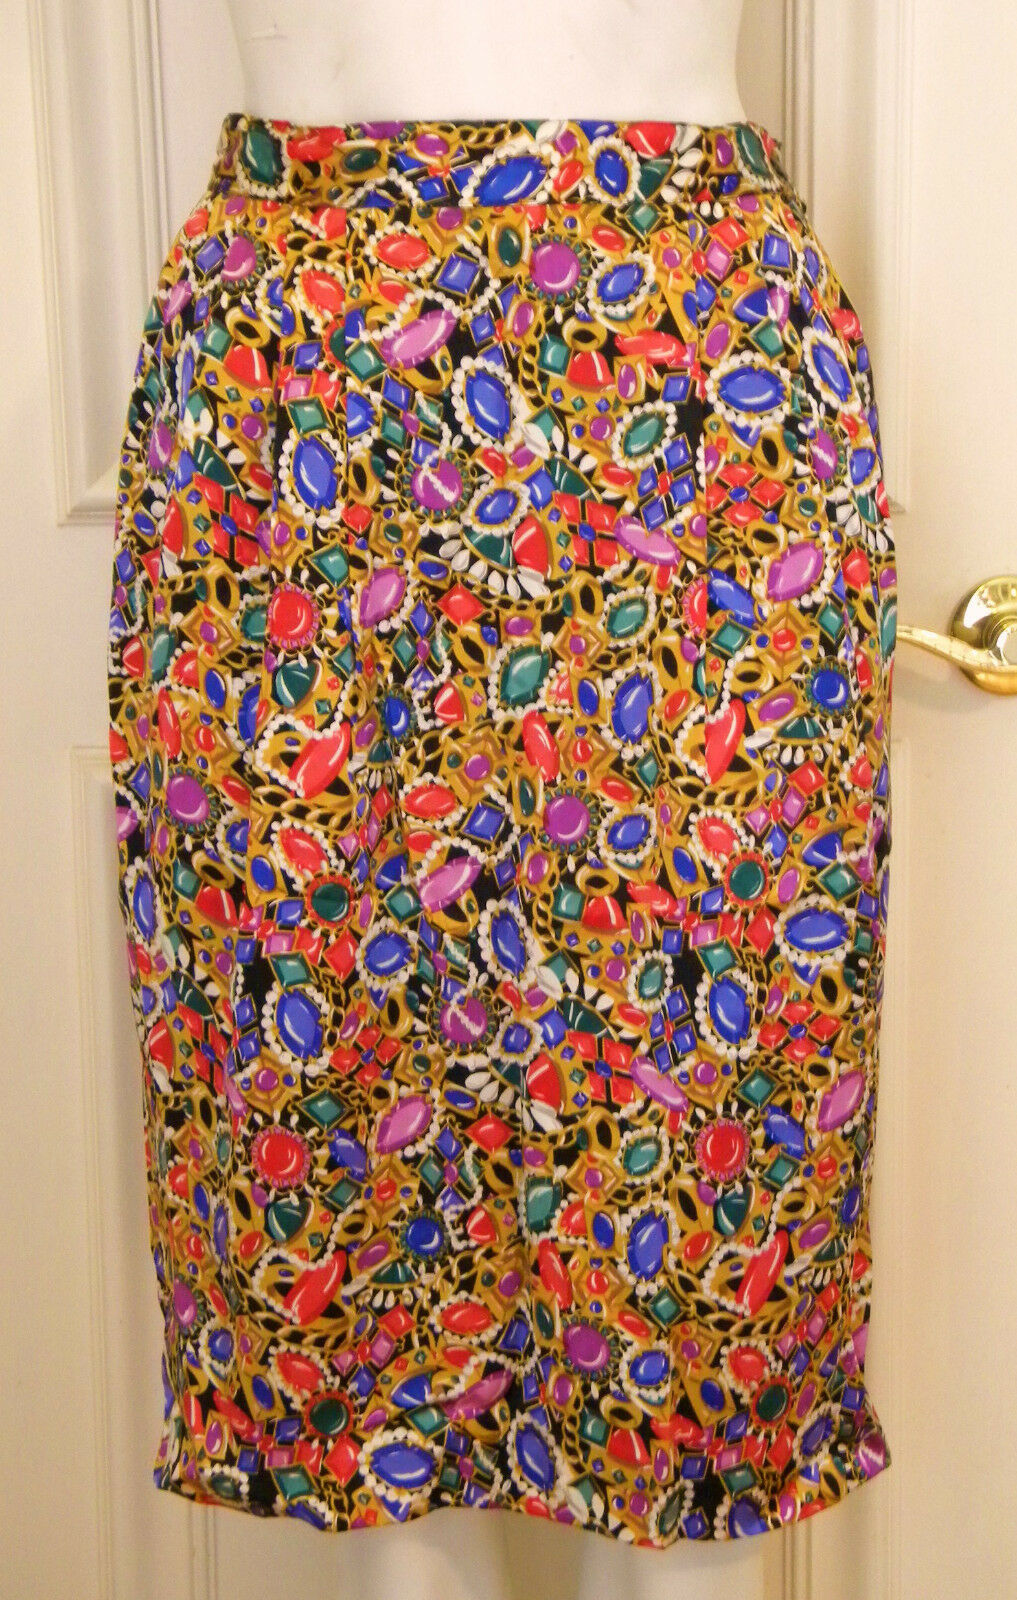 Talbots skirt silk jewel print 10 colorful lined 28  waist holiday career